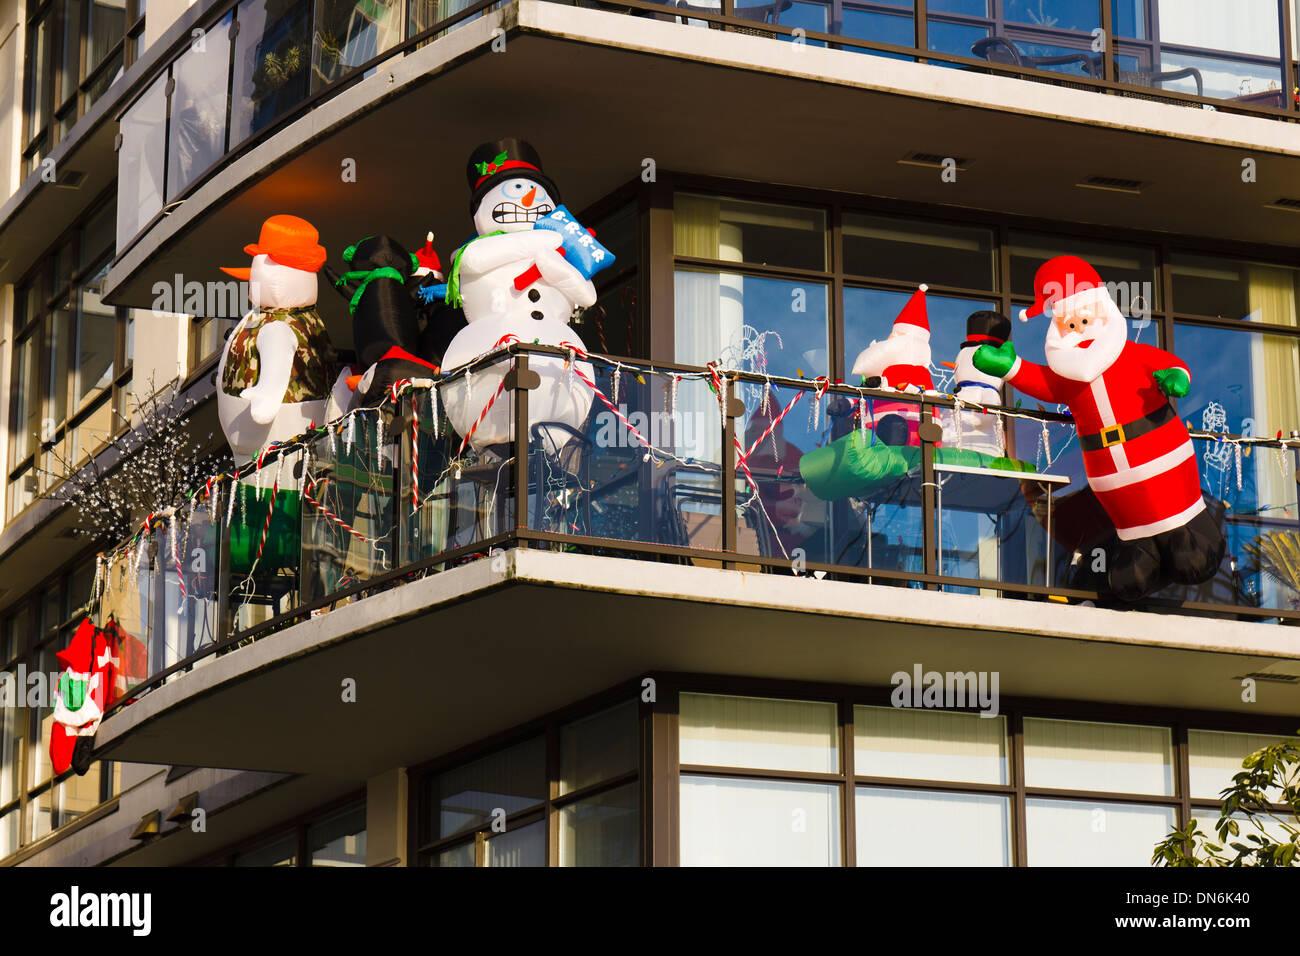 Inflatable Christmas decorations on a balcony. Snowman, Santa ...